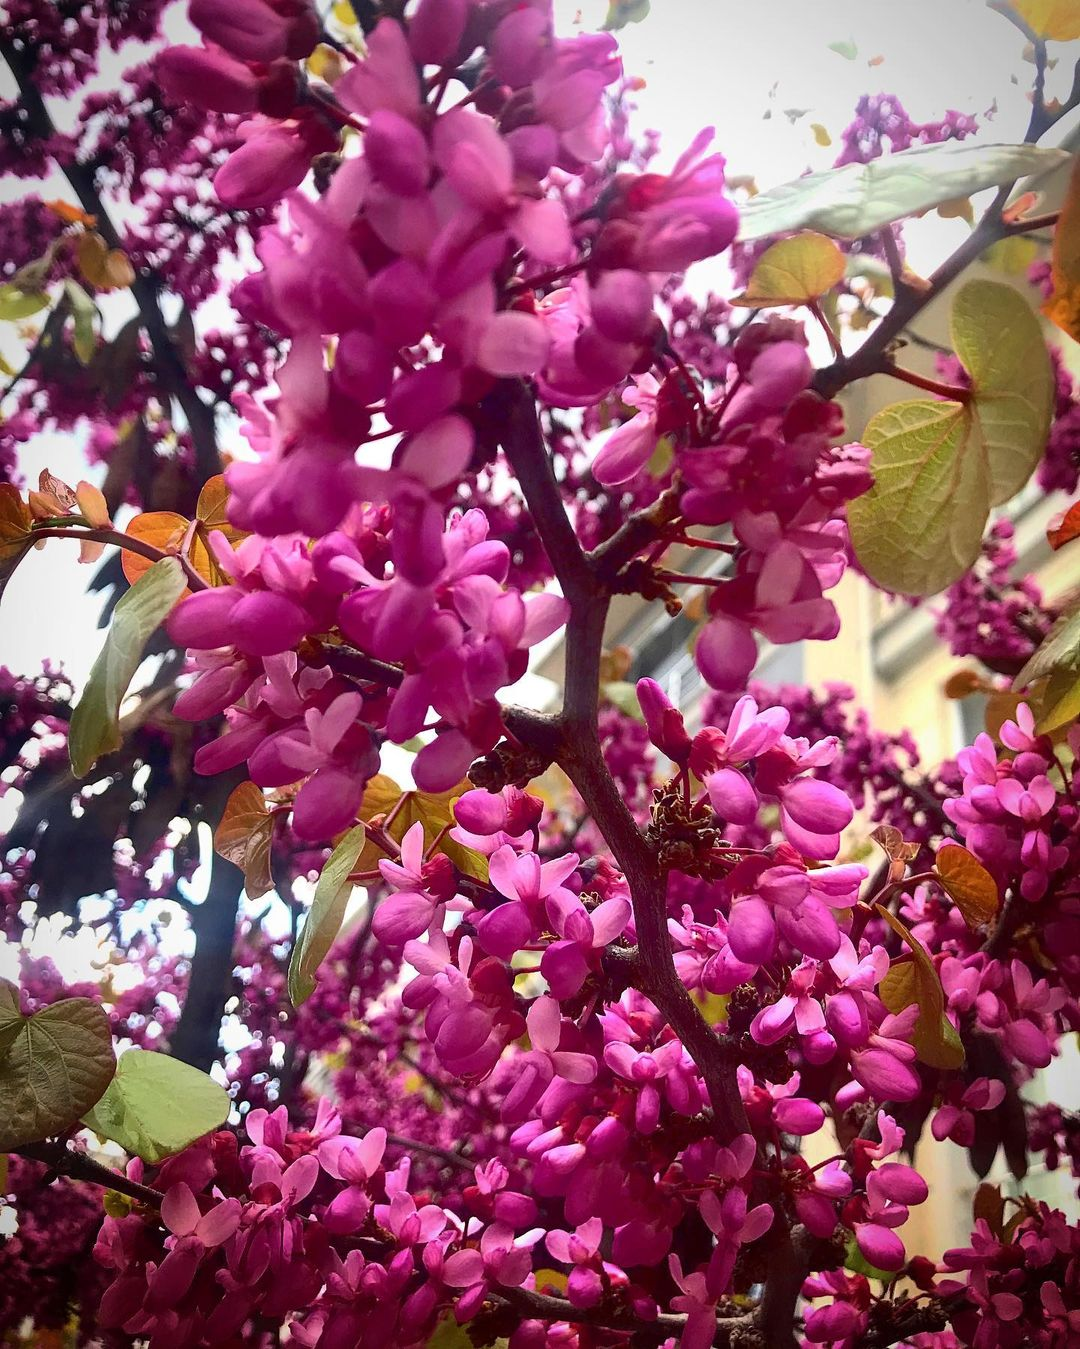 Erguvan Nerede erguvan rengi erguvan ağacı erguvan çiçeği erguvan ne demek